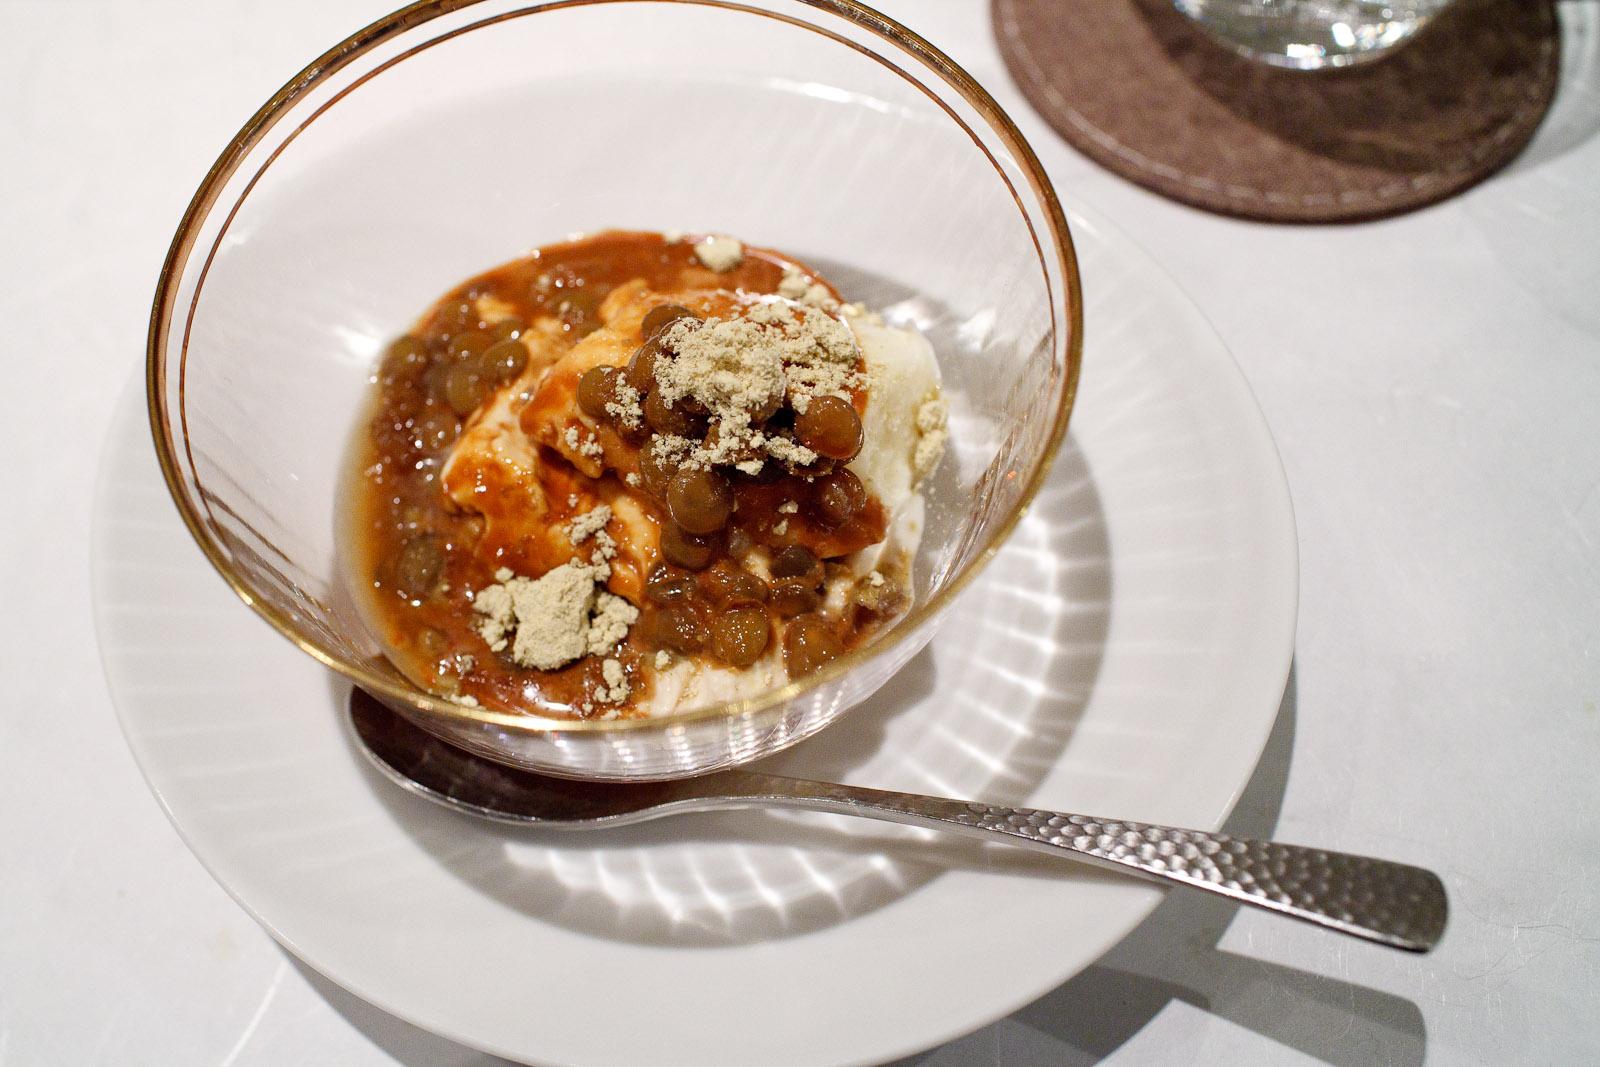 Esaki, Tokyo - Milk pudding, ginger ice cream, soybeans